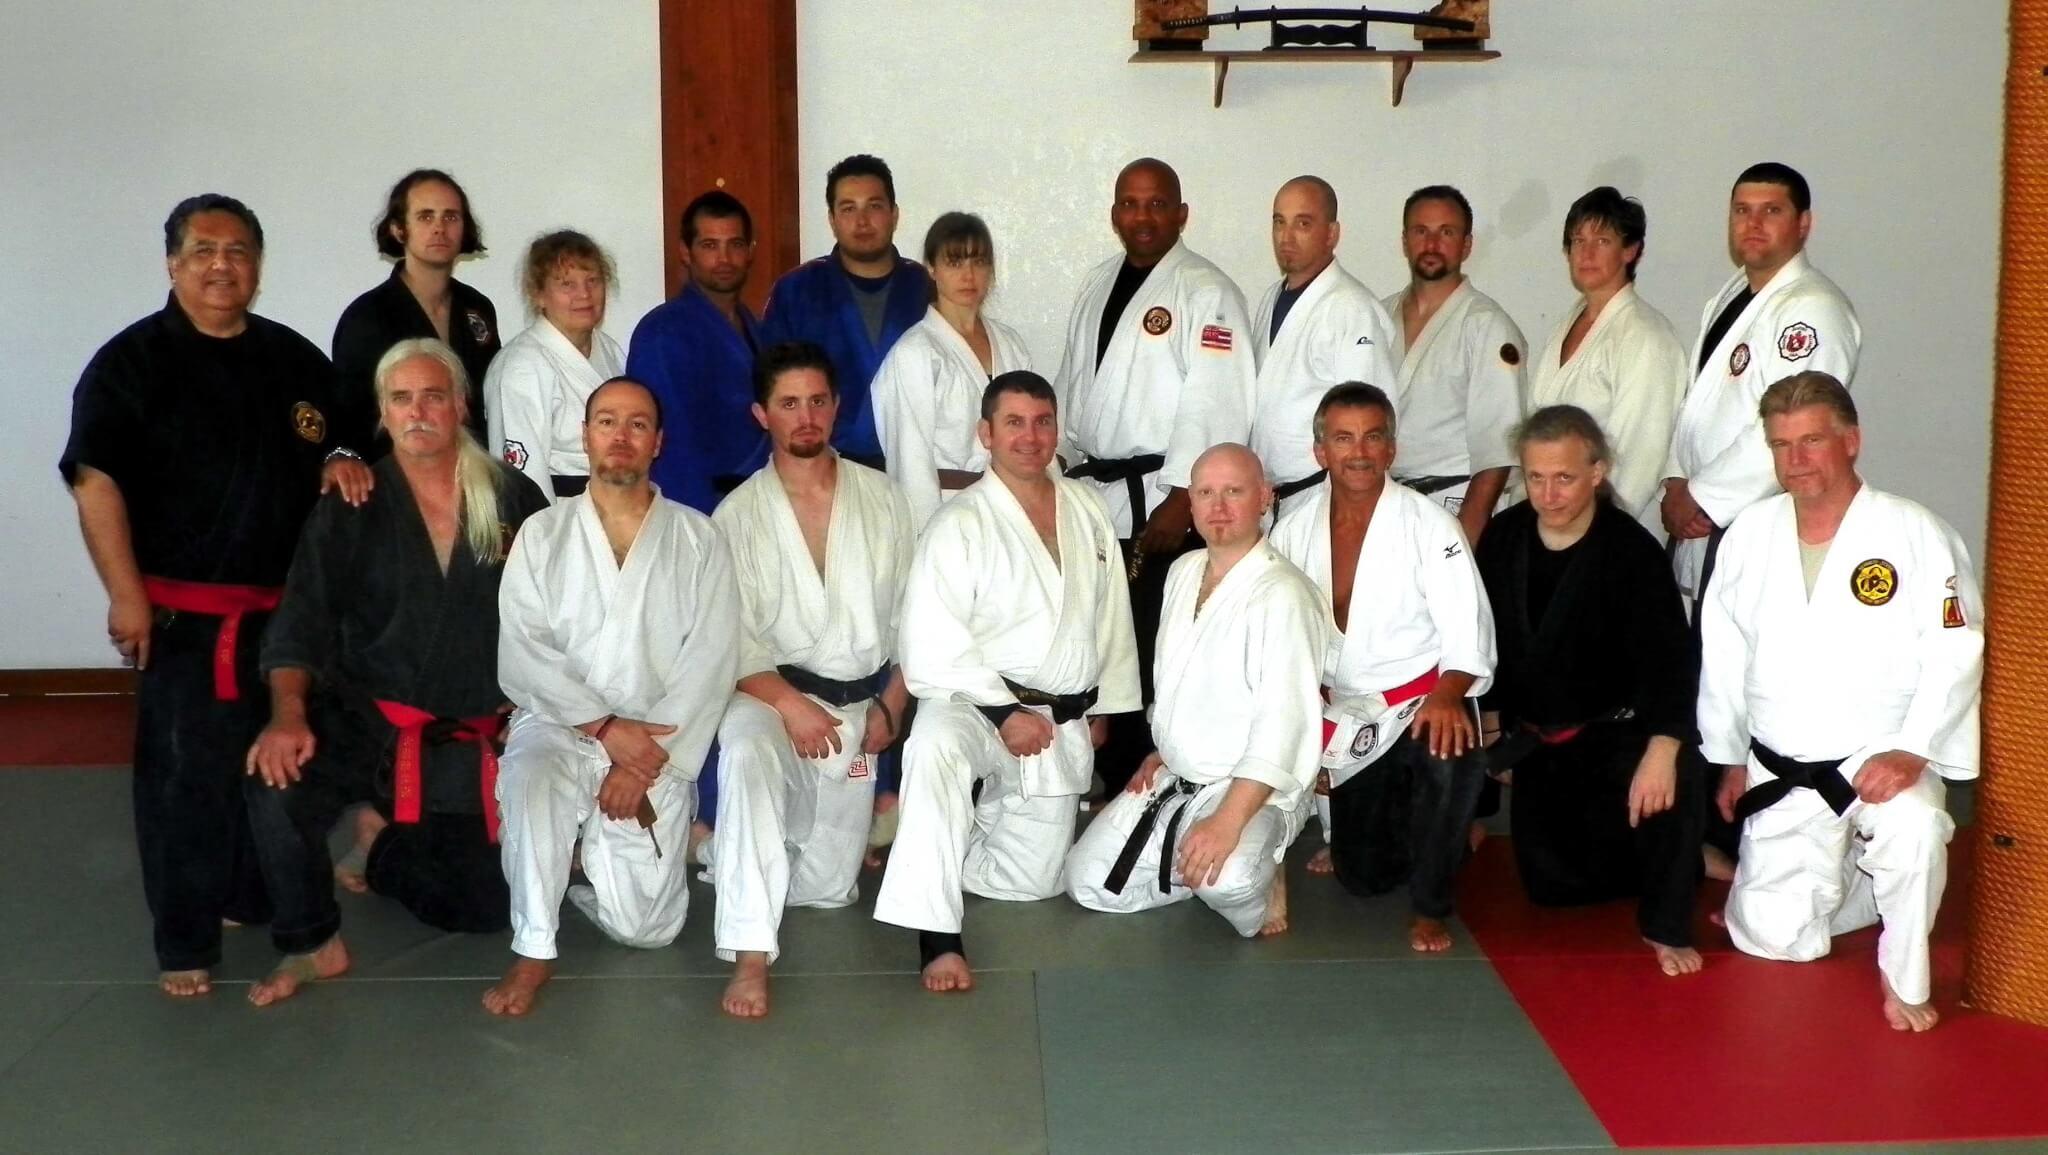 Kilohana Leaders